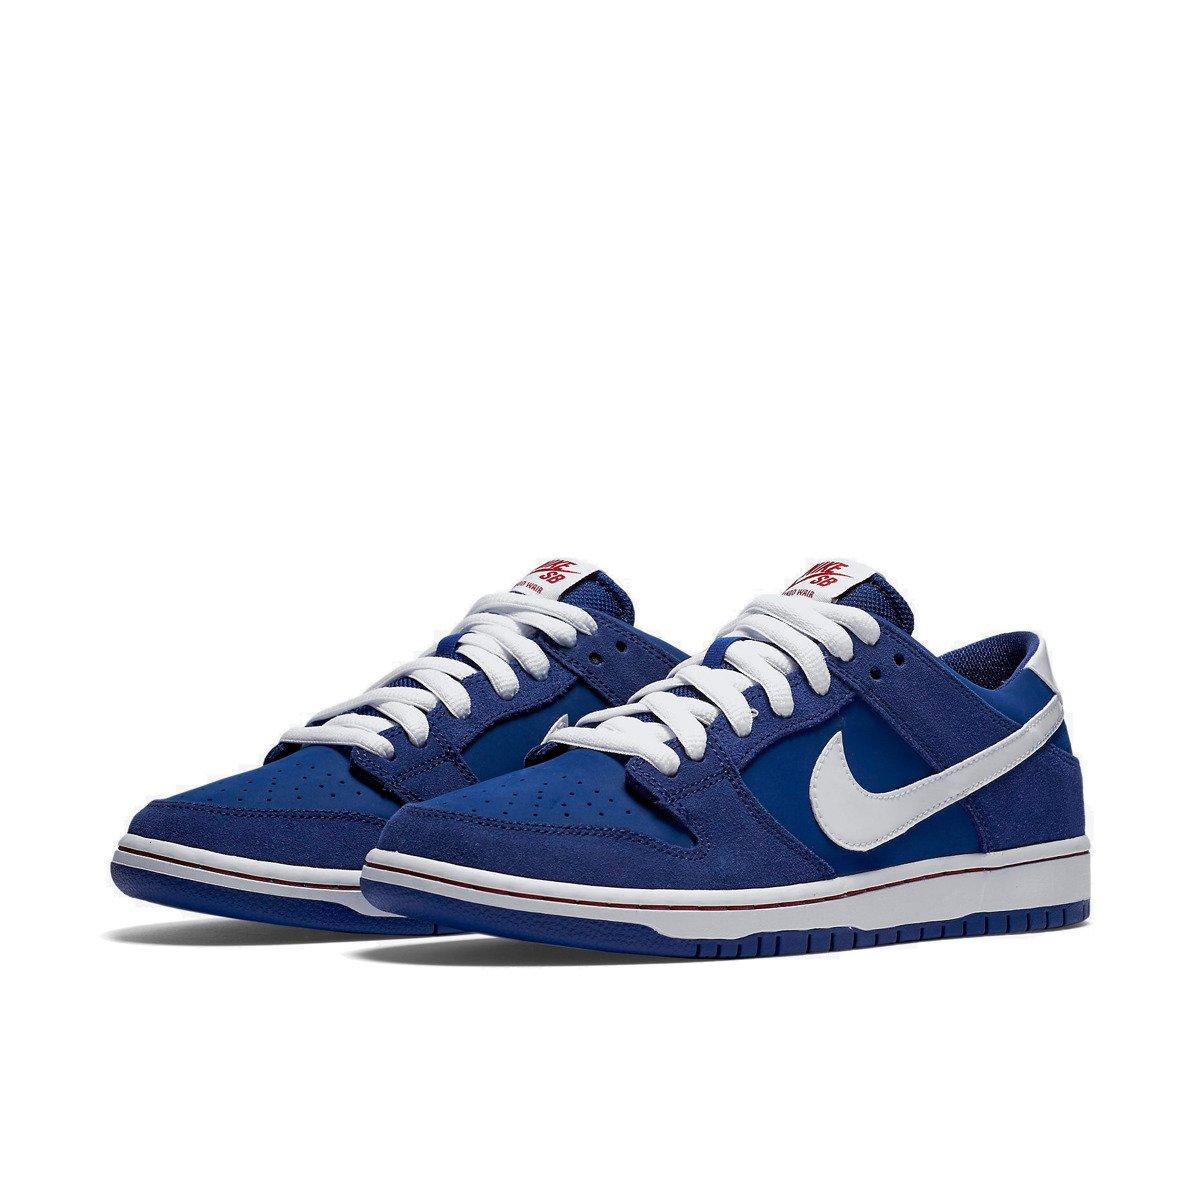 best sneakers 759a8 58dd0 ... white K3k1f  premium selection 0bce4 37d0c ... Buty Nike SB Dunk Low  Pro Ishod Wair Deep